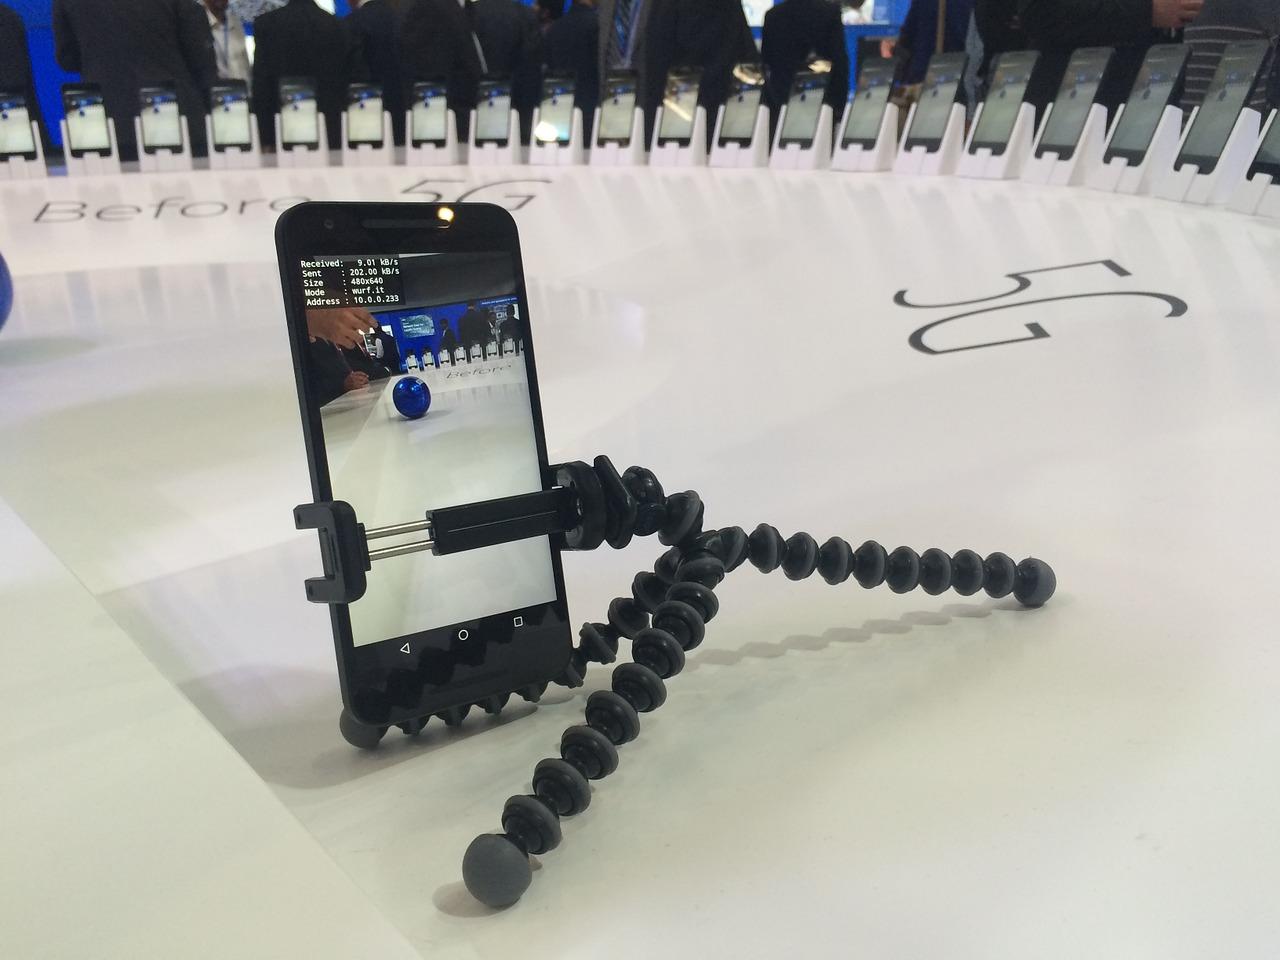 La 5G, un enjeu majeur